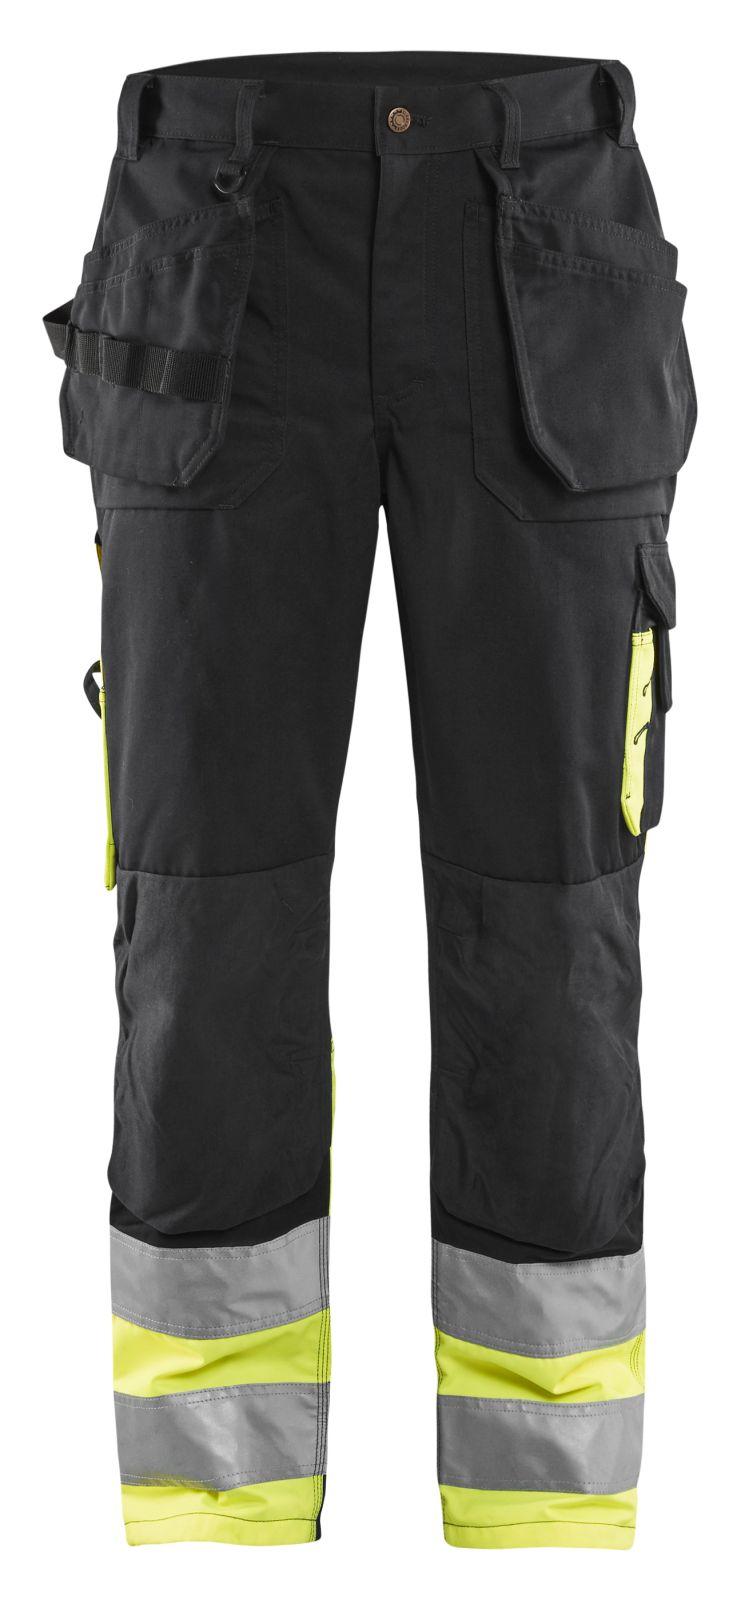 Blaklader Werkbroeken 15291860 High Vis zwart-geel(9933)